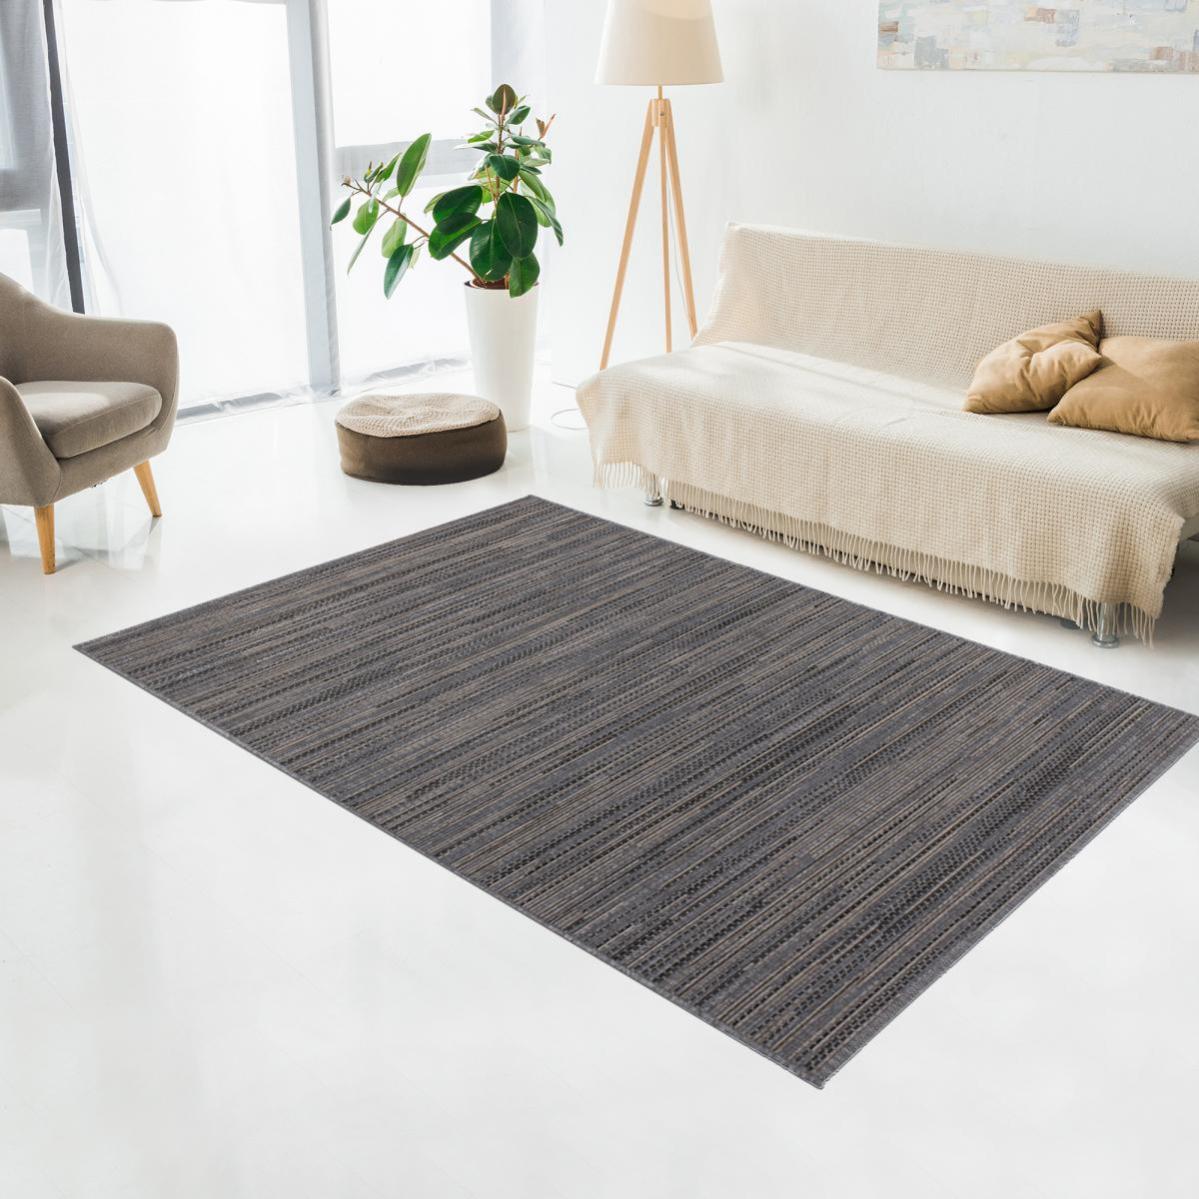 tapis moderne 200x290 cm rectangulaire sunsau interieur